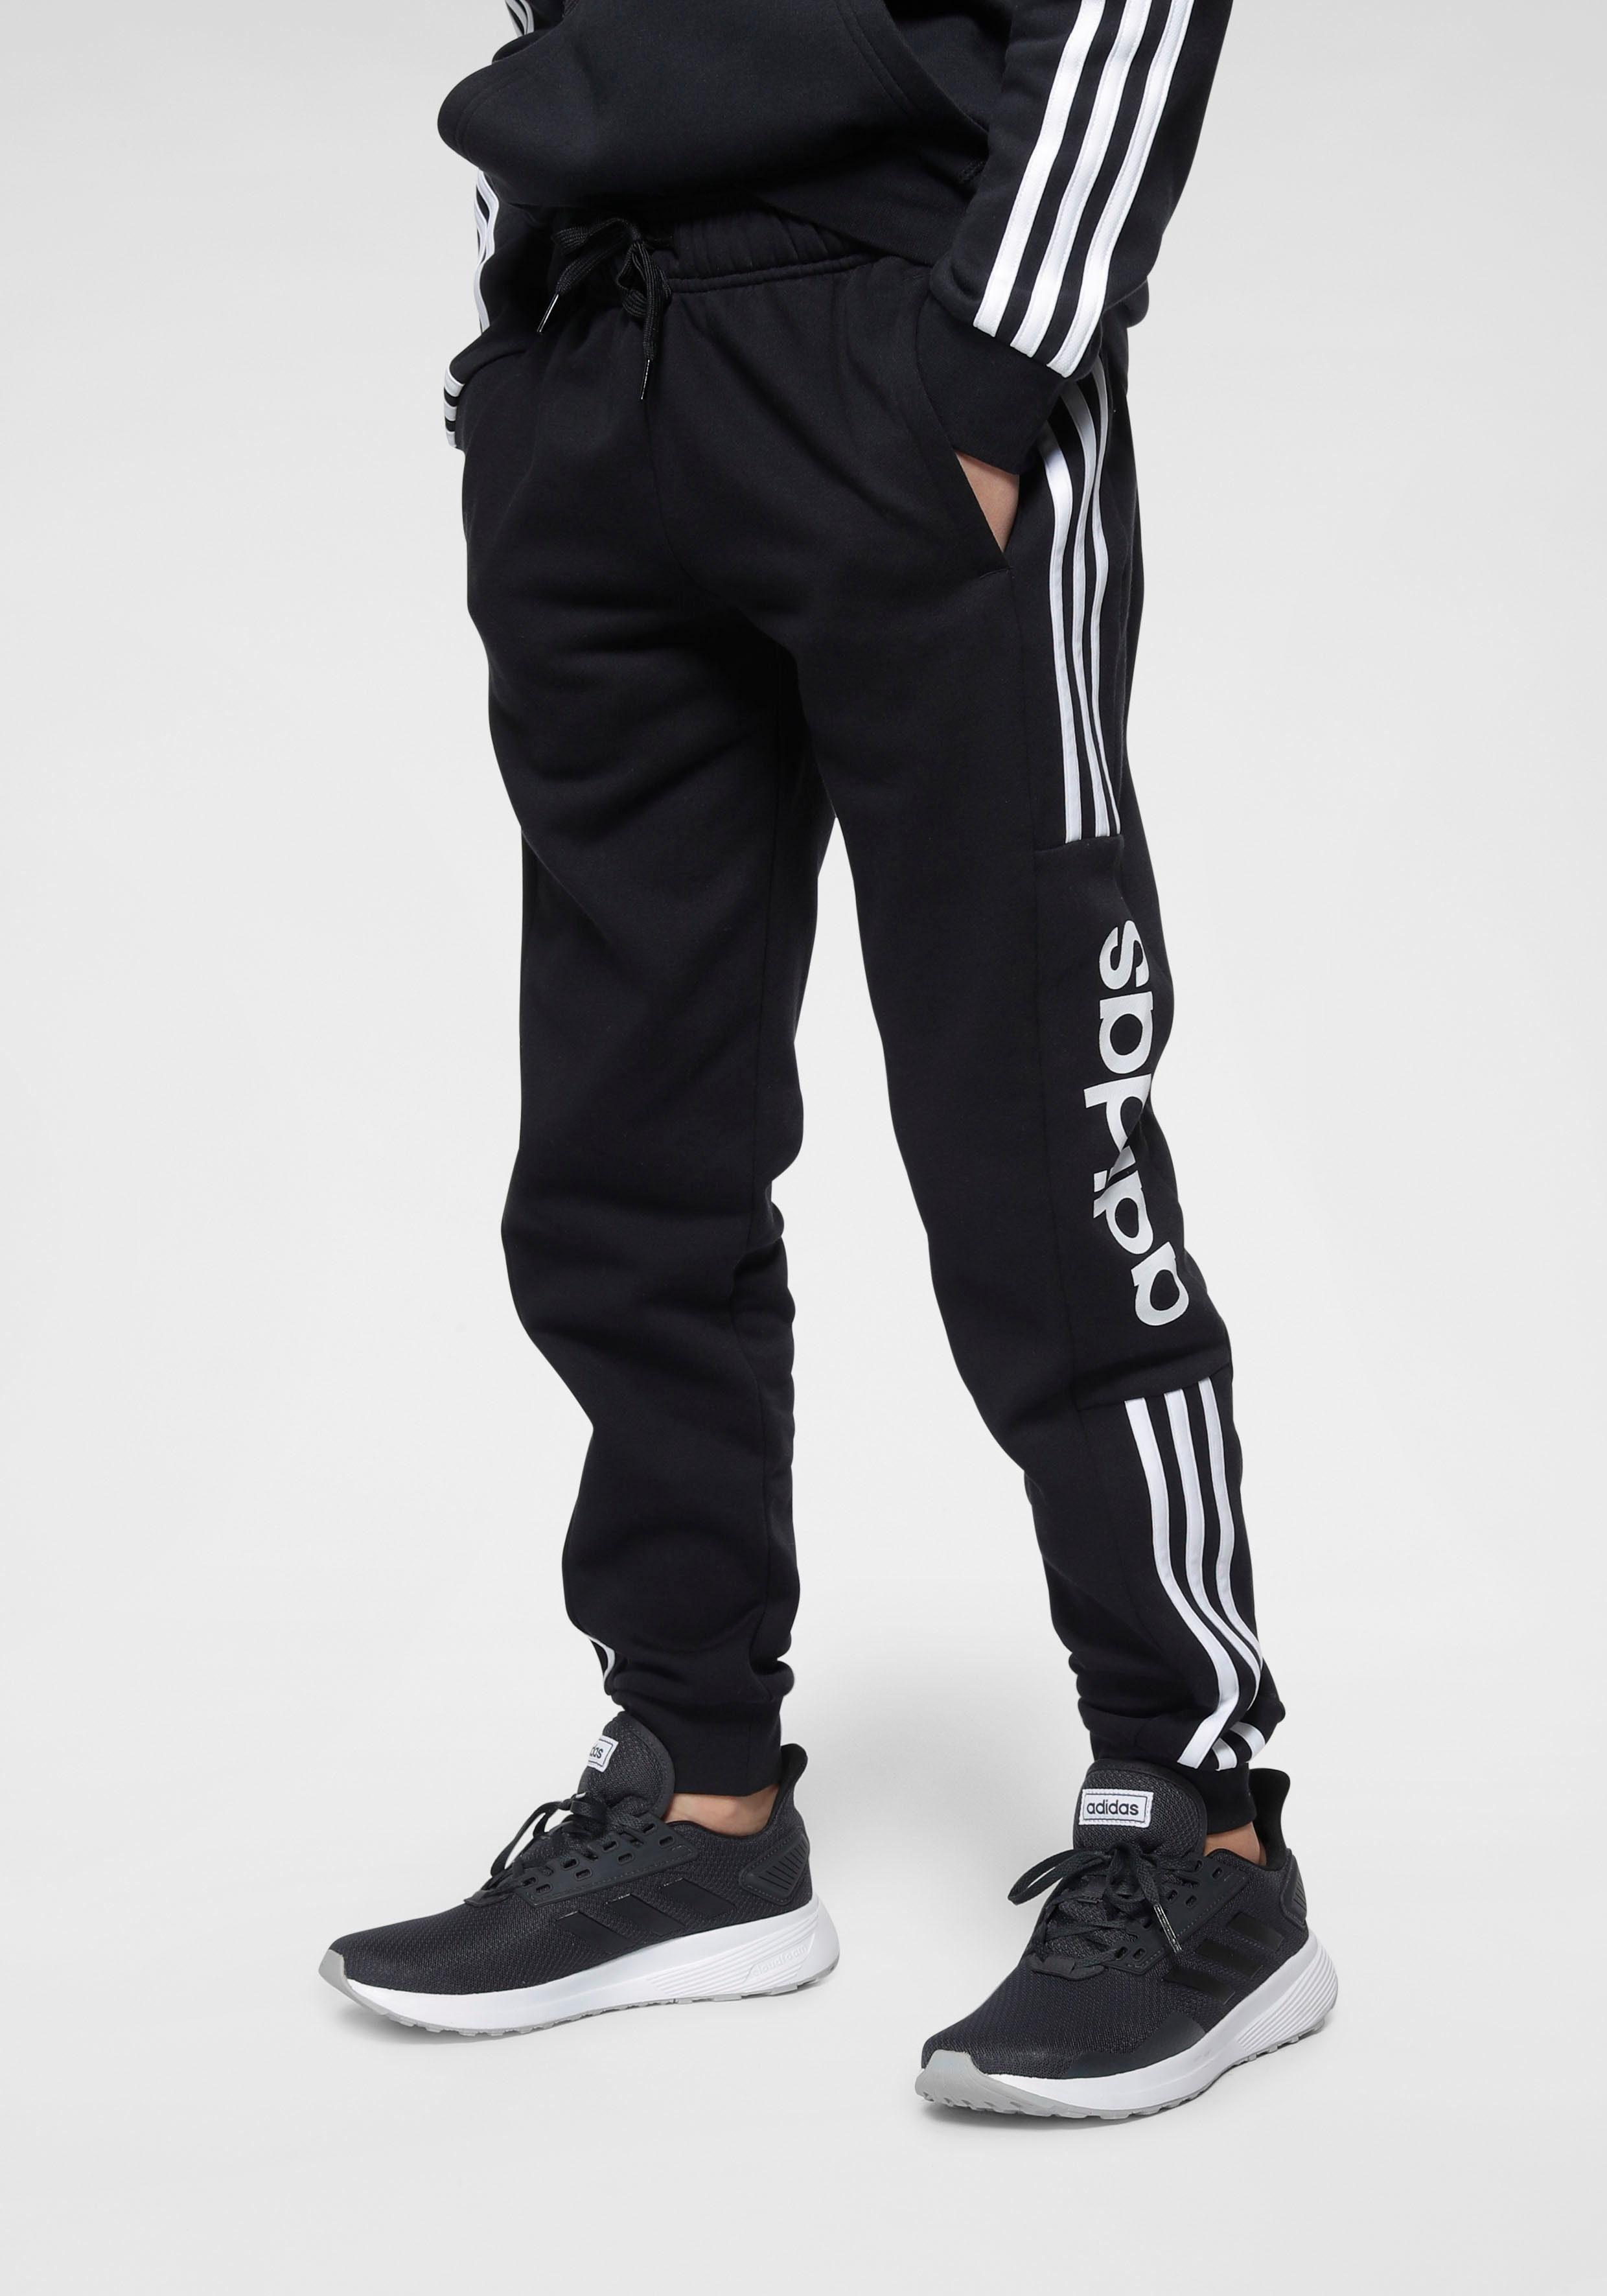 adidas Jogginghose »B CB ESS PANT«, Logodruck online kaufen | OTTO